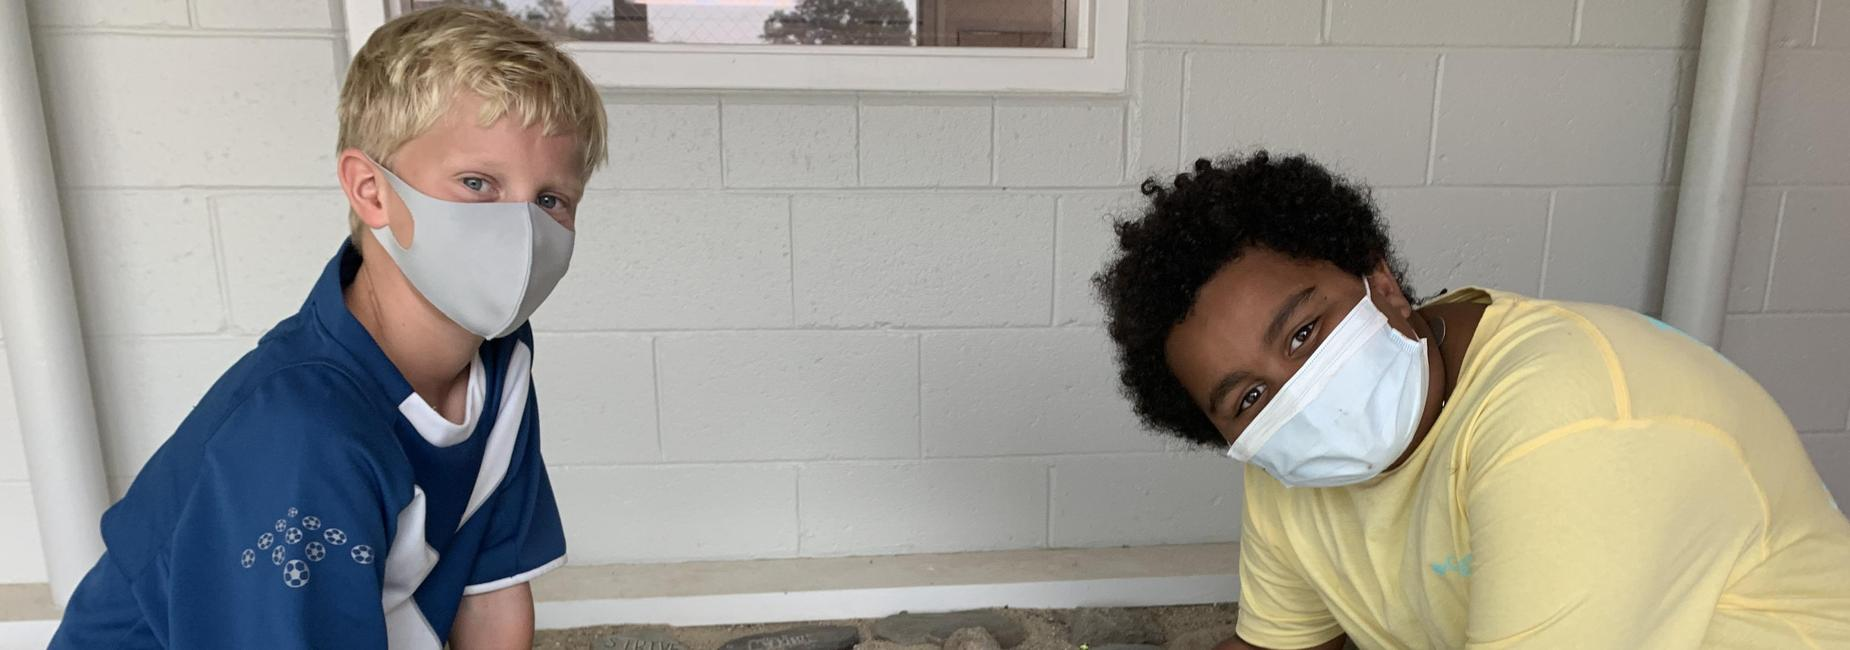 5th grade in hallway working